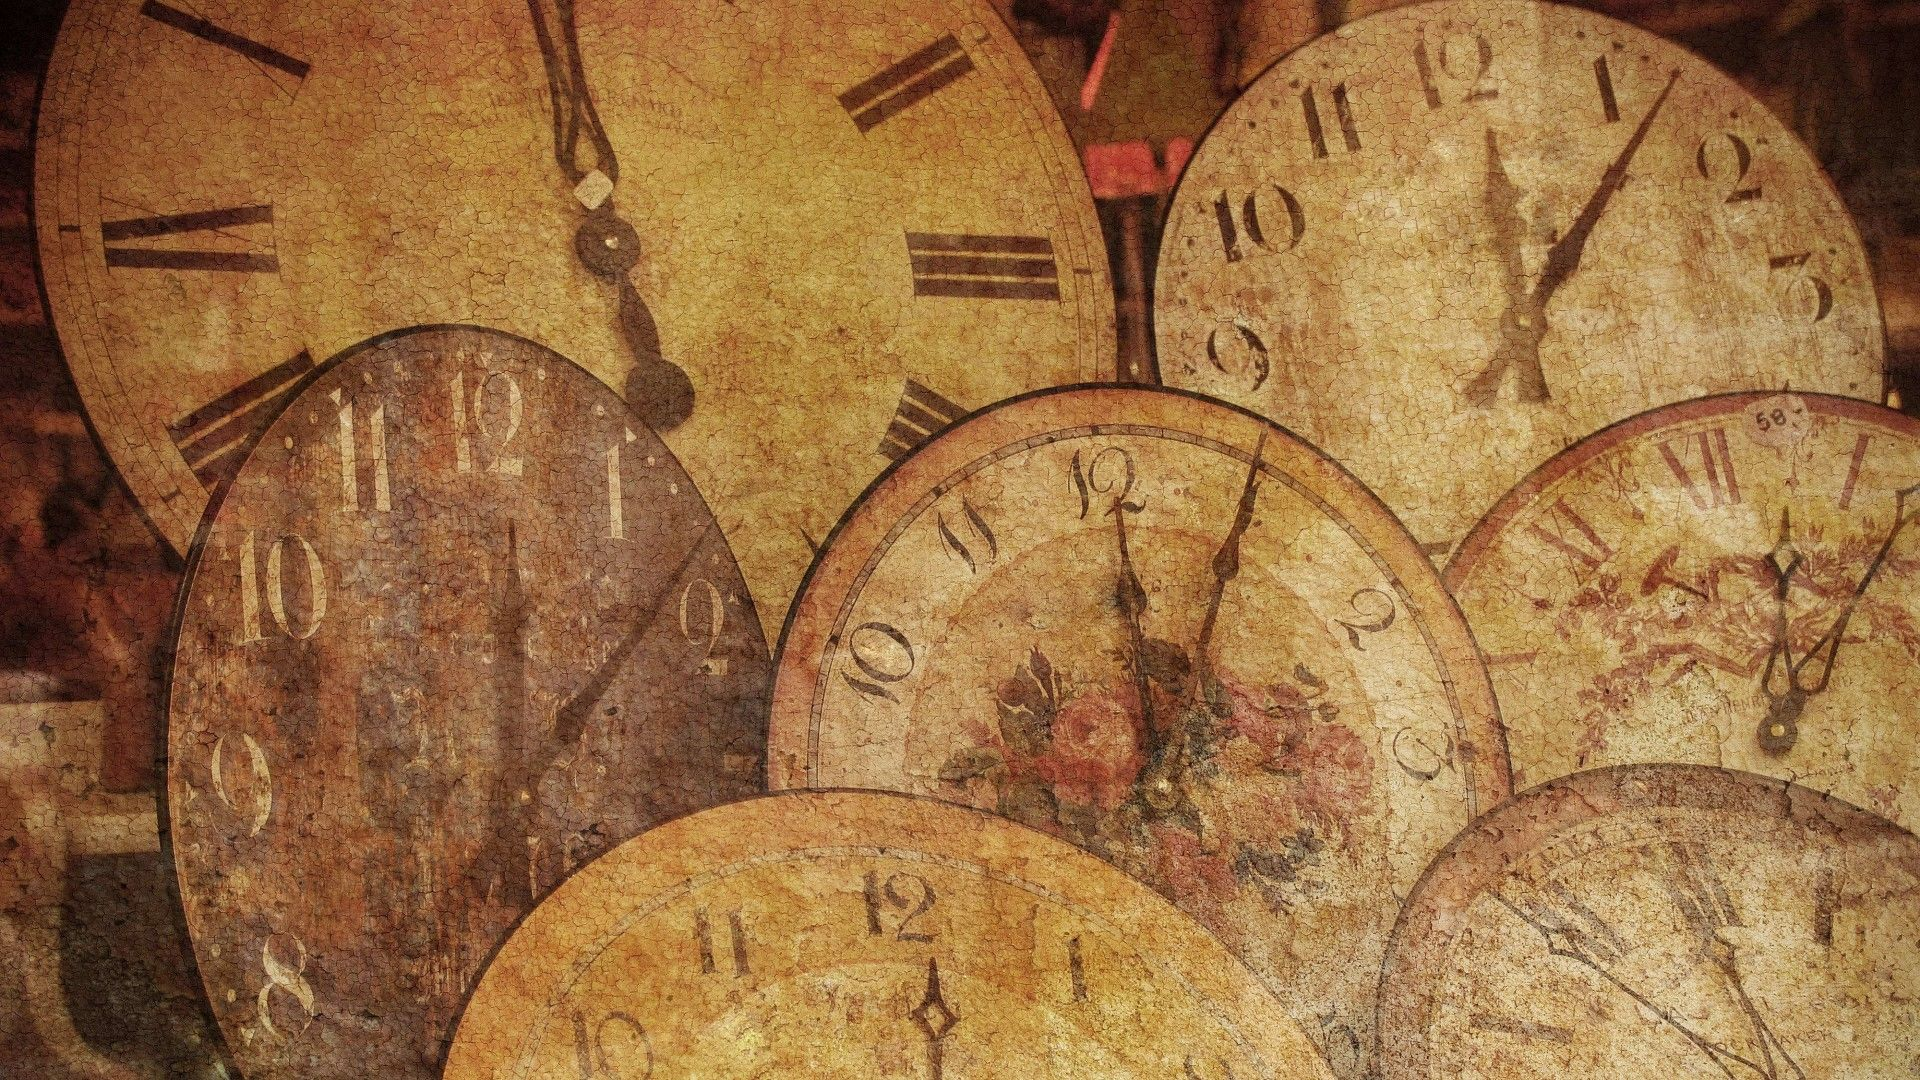 Arrow Antique Texture Clock Wallpaper Desktop Image